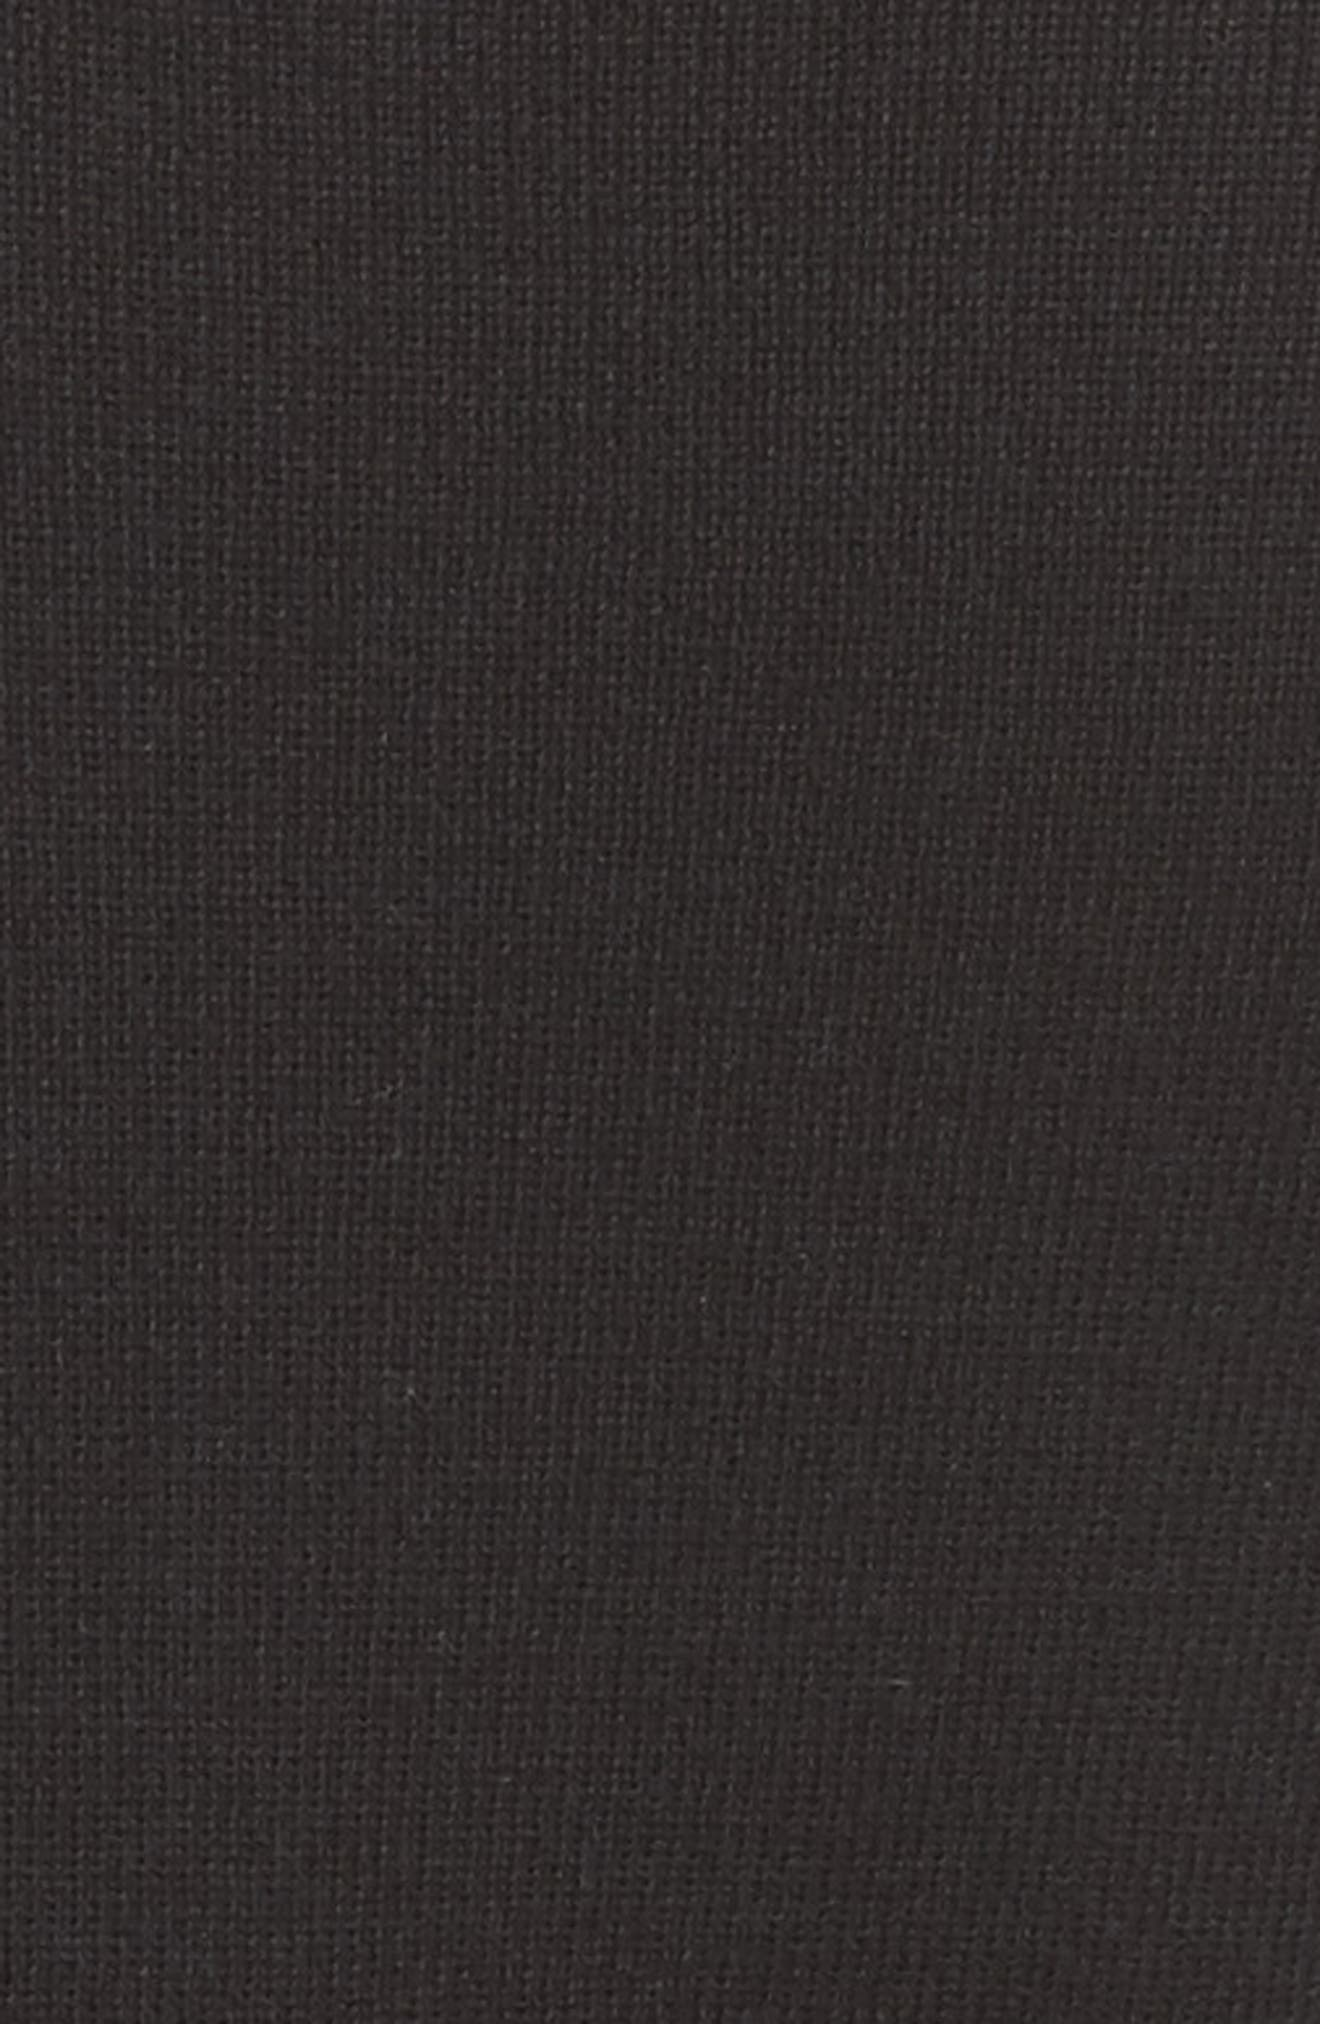 Bell Sleeve Rib Sweater,                             Alternate thumbnail 17, color,